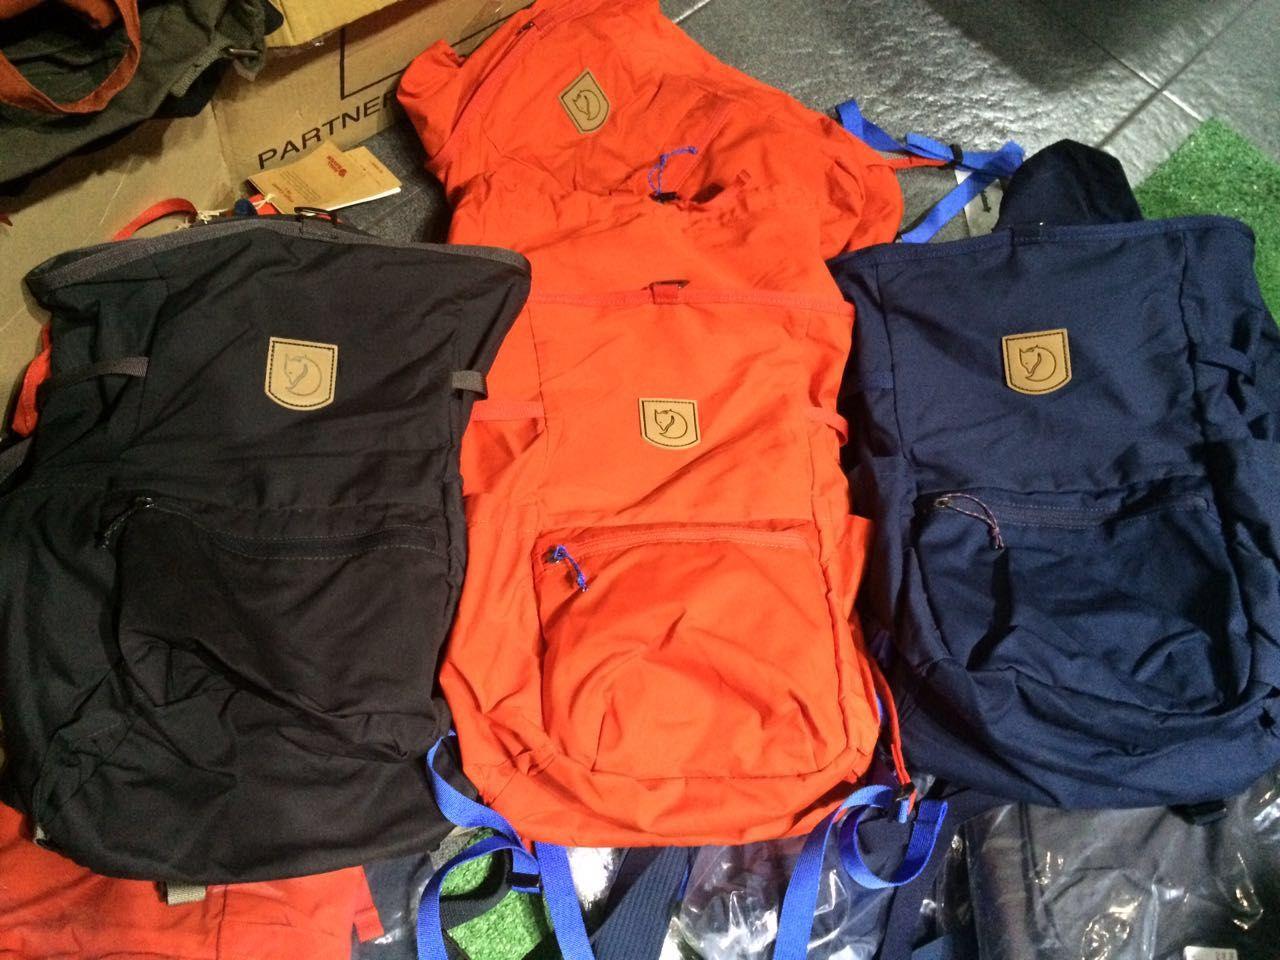 Jual Tas Fjallraven High Coast 24 Backpack Daypack - RUANG RAUNG OUTDOOR… 57d532be2253d